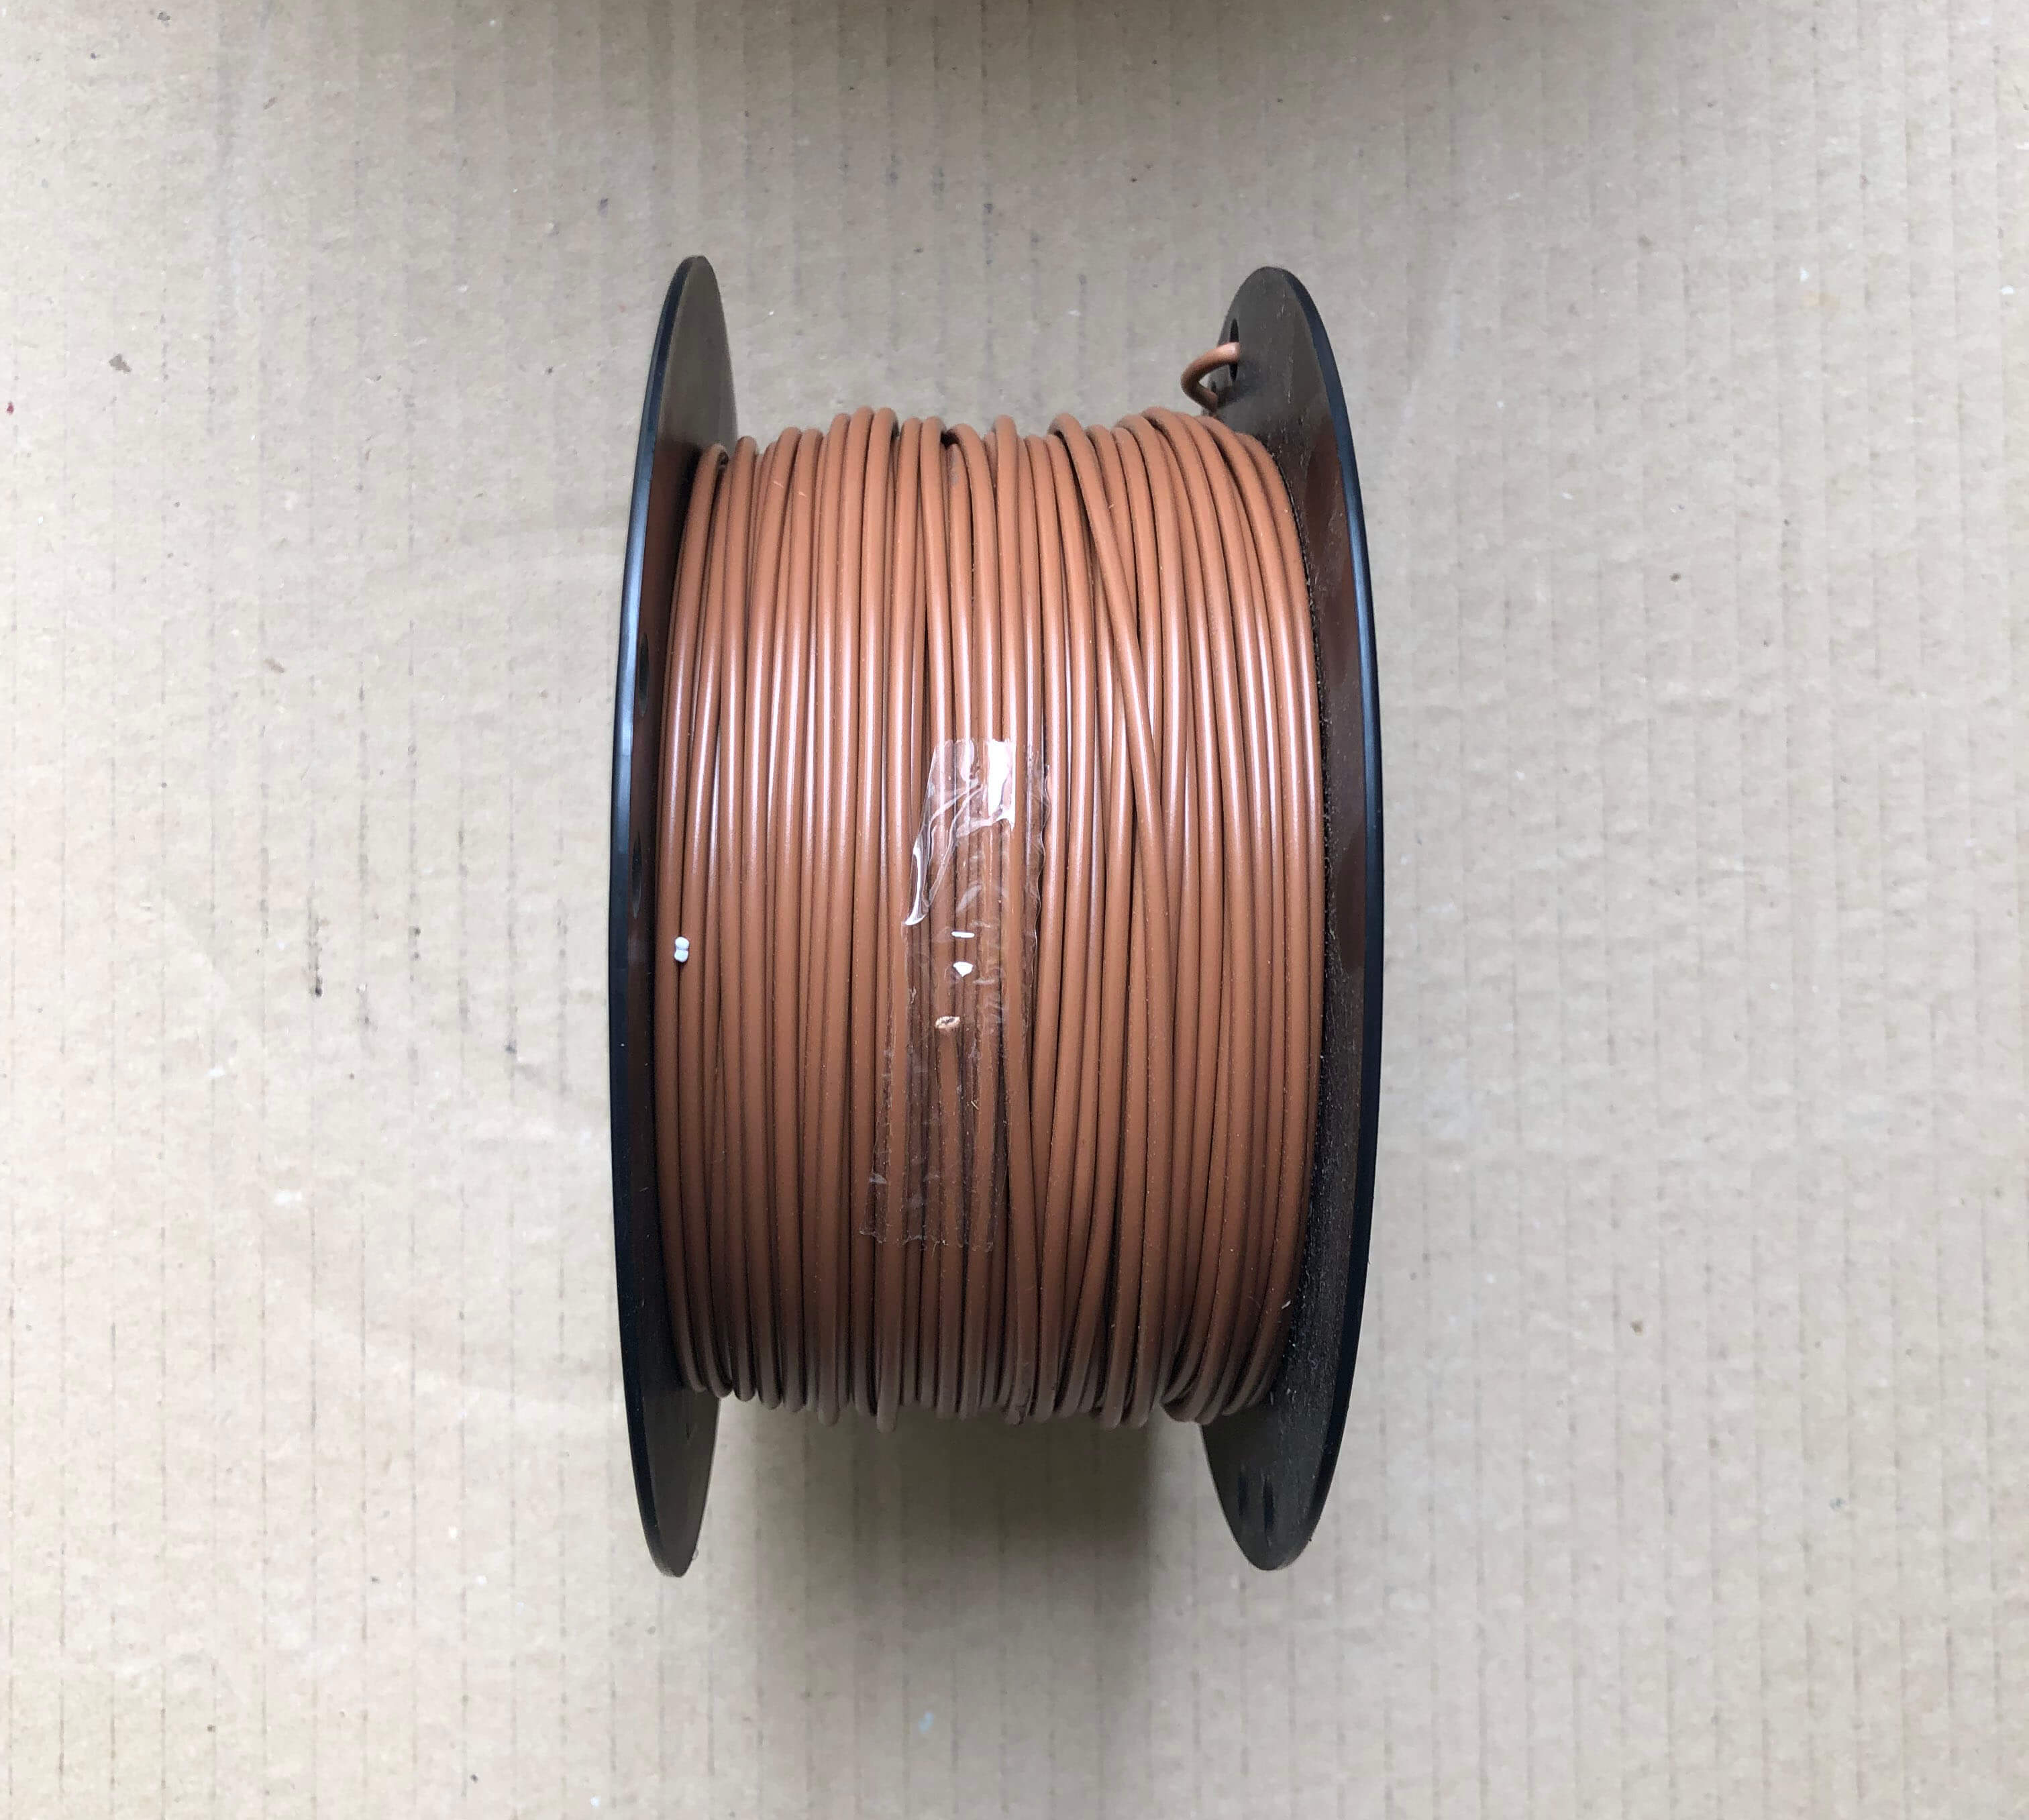 Przewód 150 mb (L30)